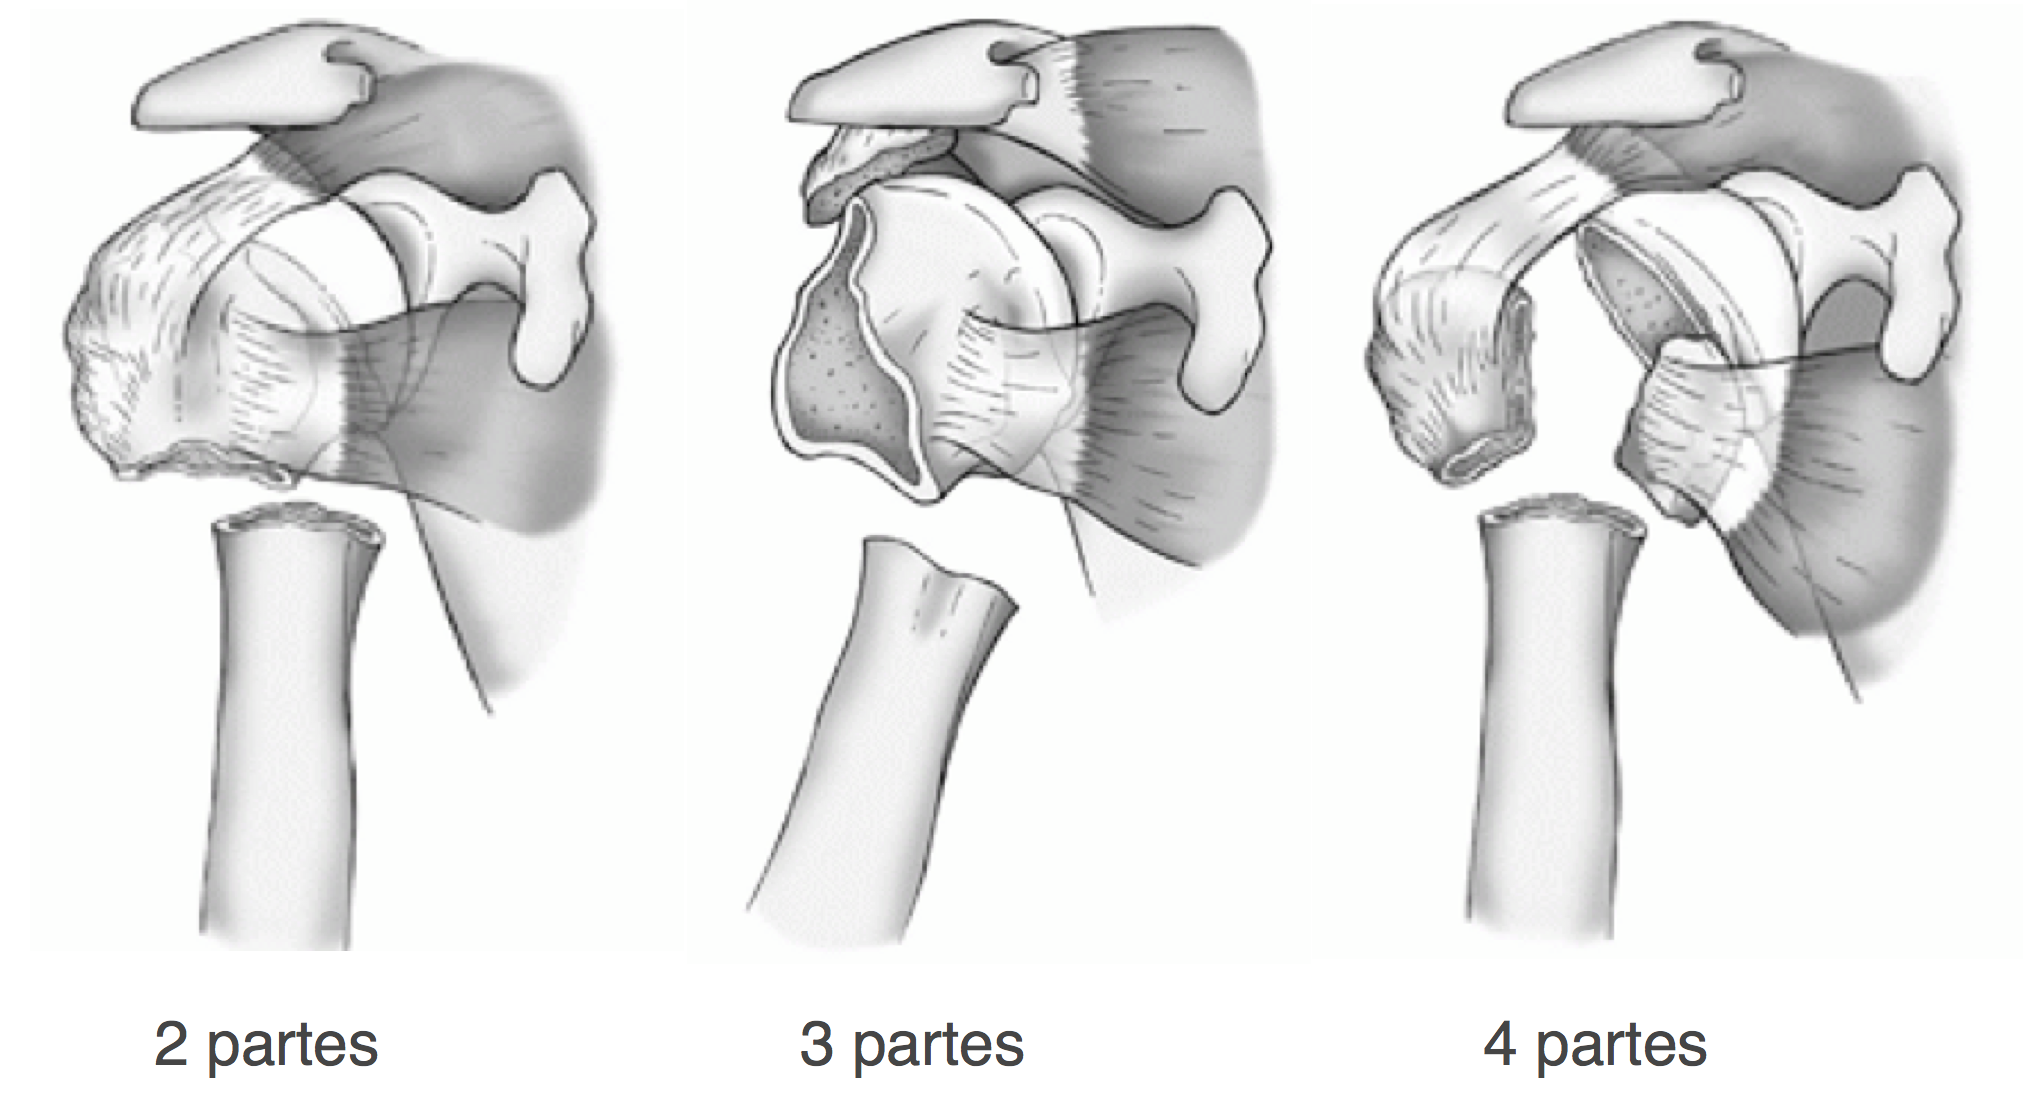 Diferentes partes da fratura